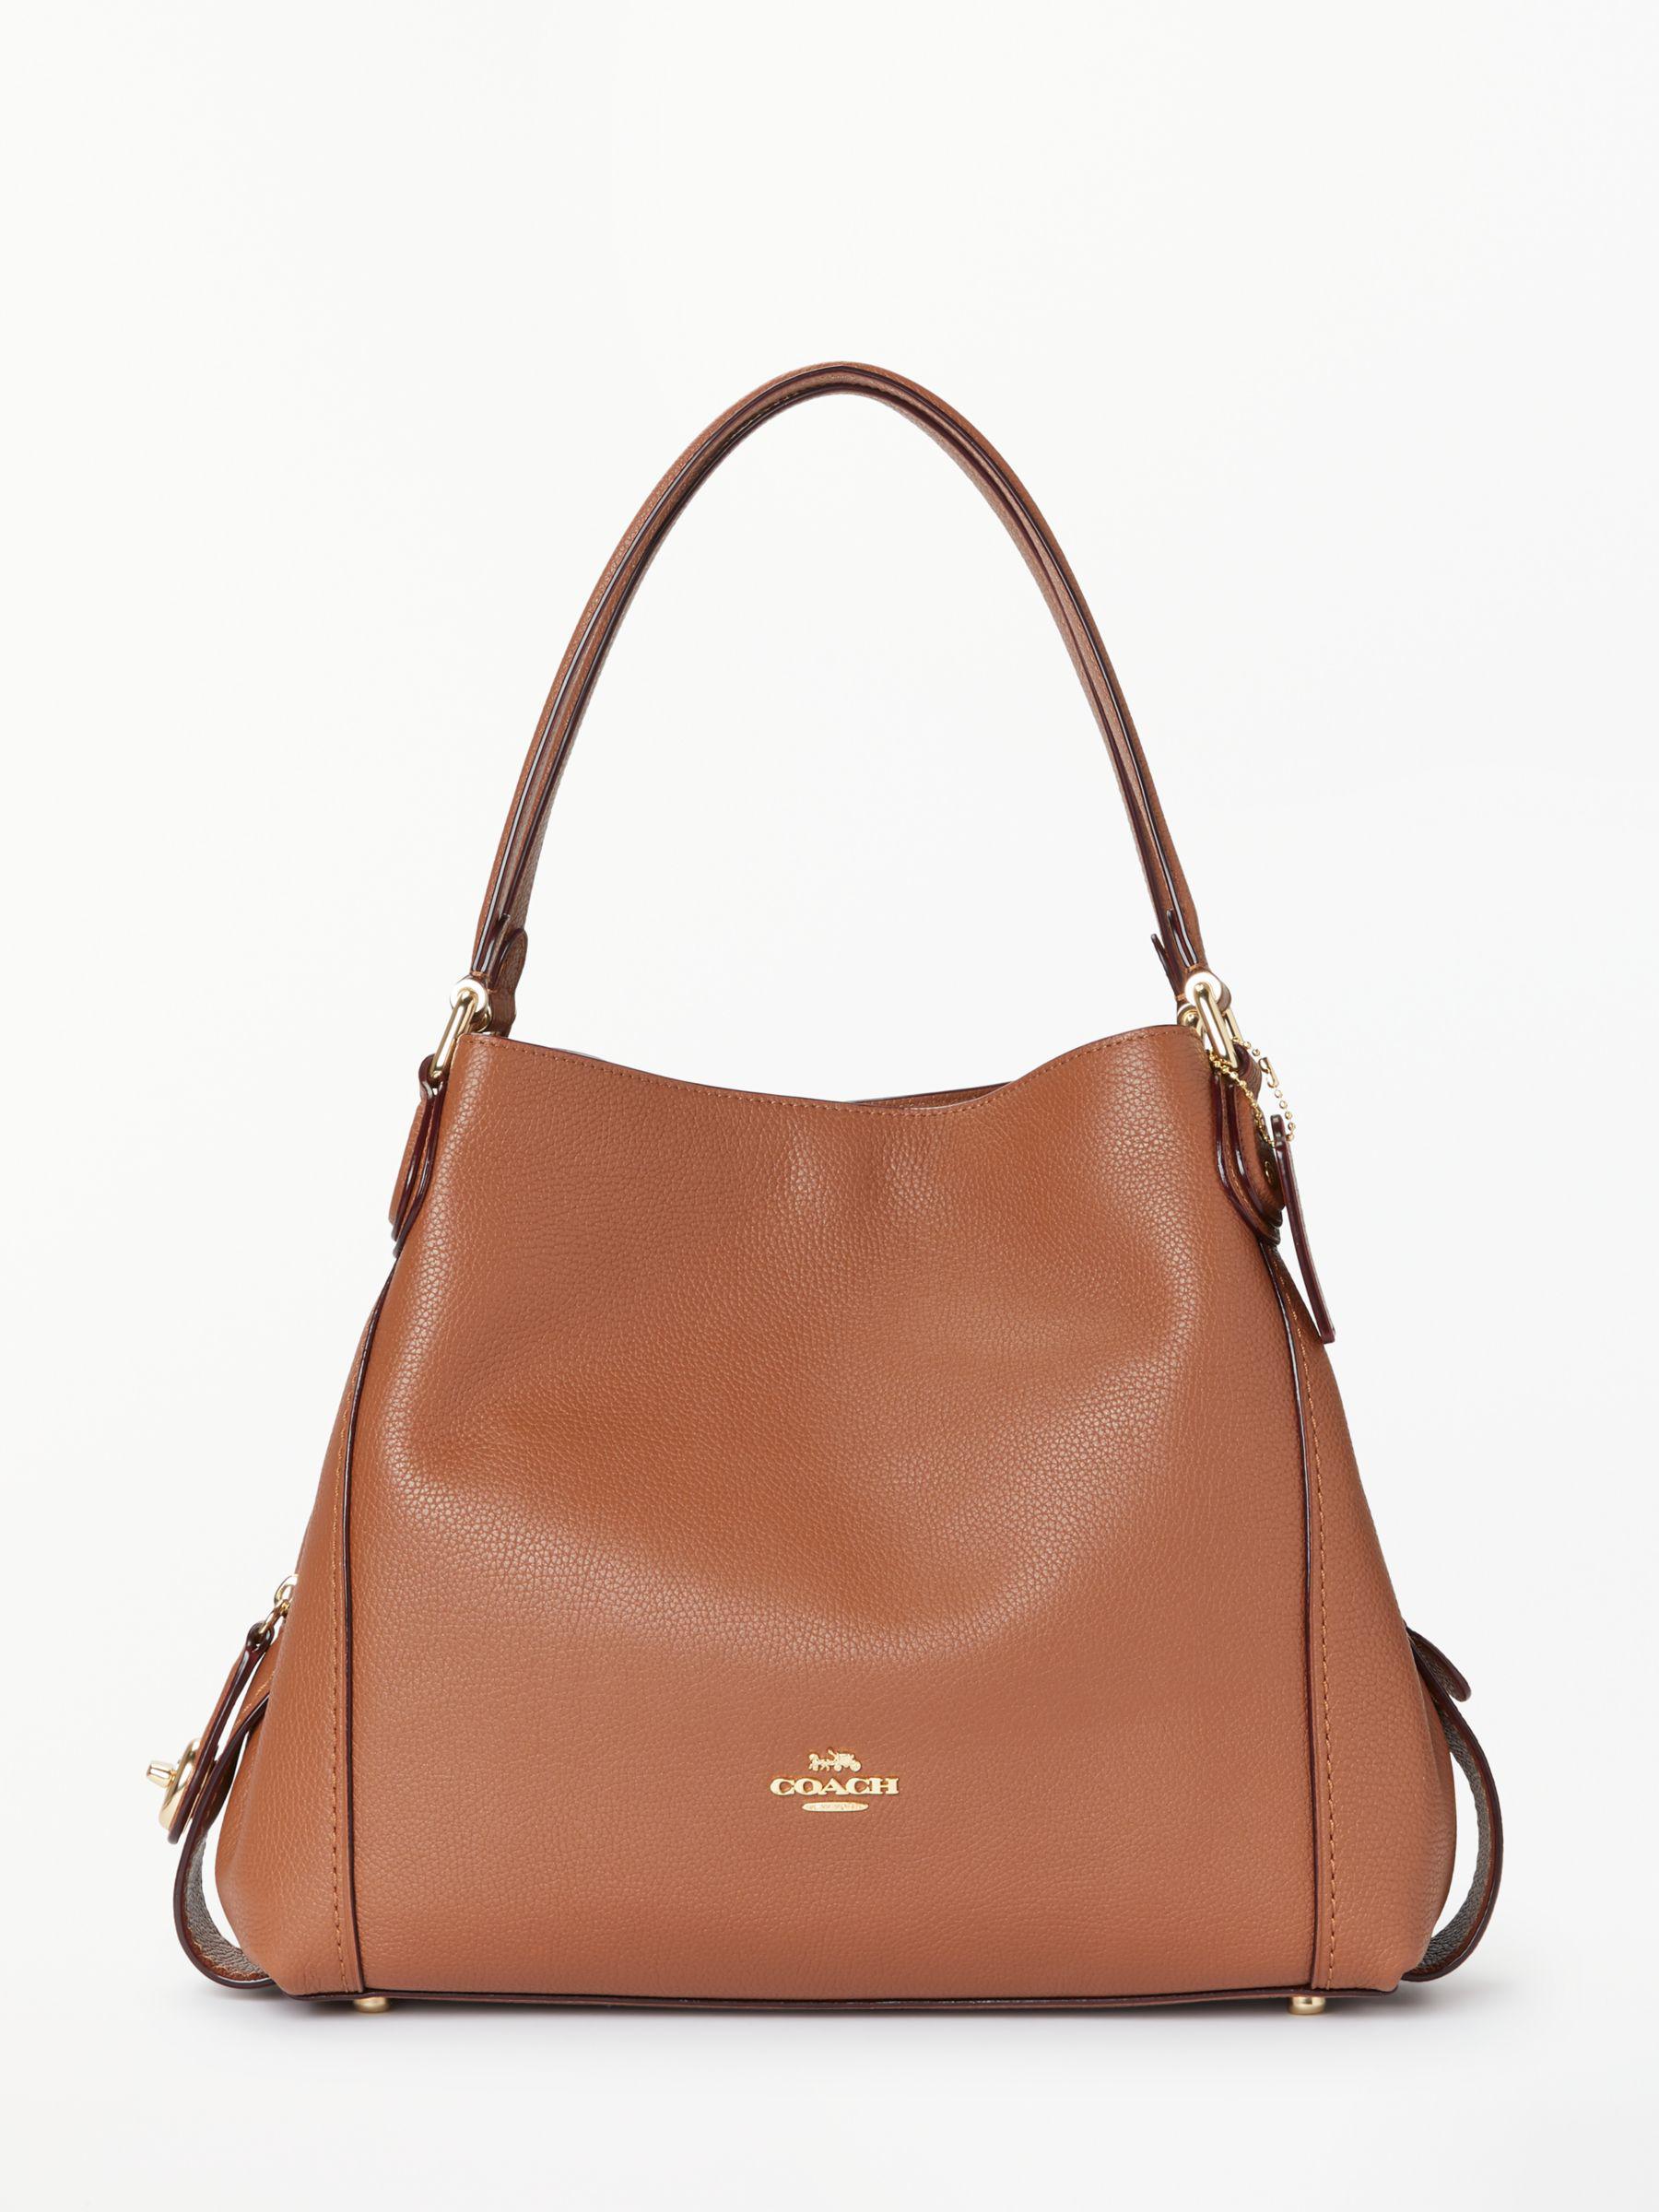 65c525f396b8 COACH - Brown Edie 31 Polished Pebble Leather Shoulder Bag - Lyst. View  fullscreen